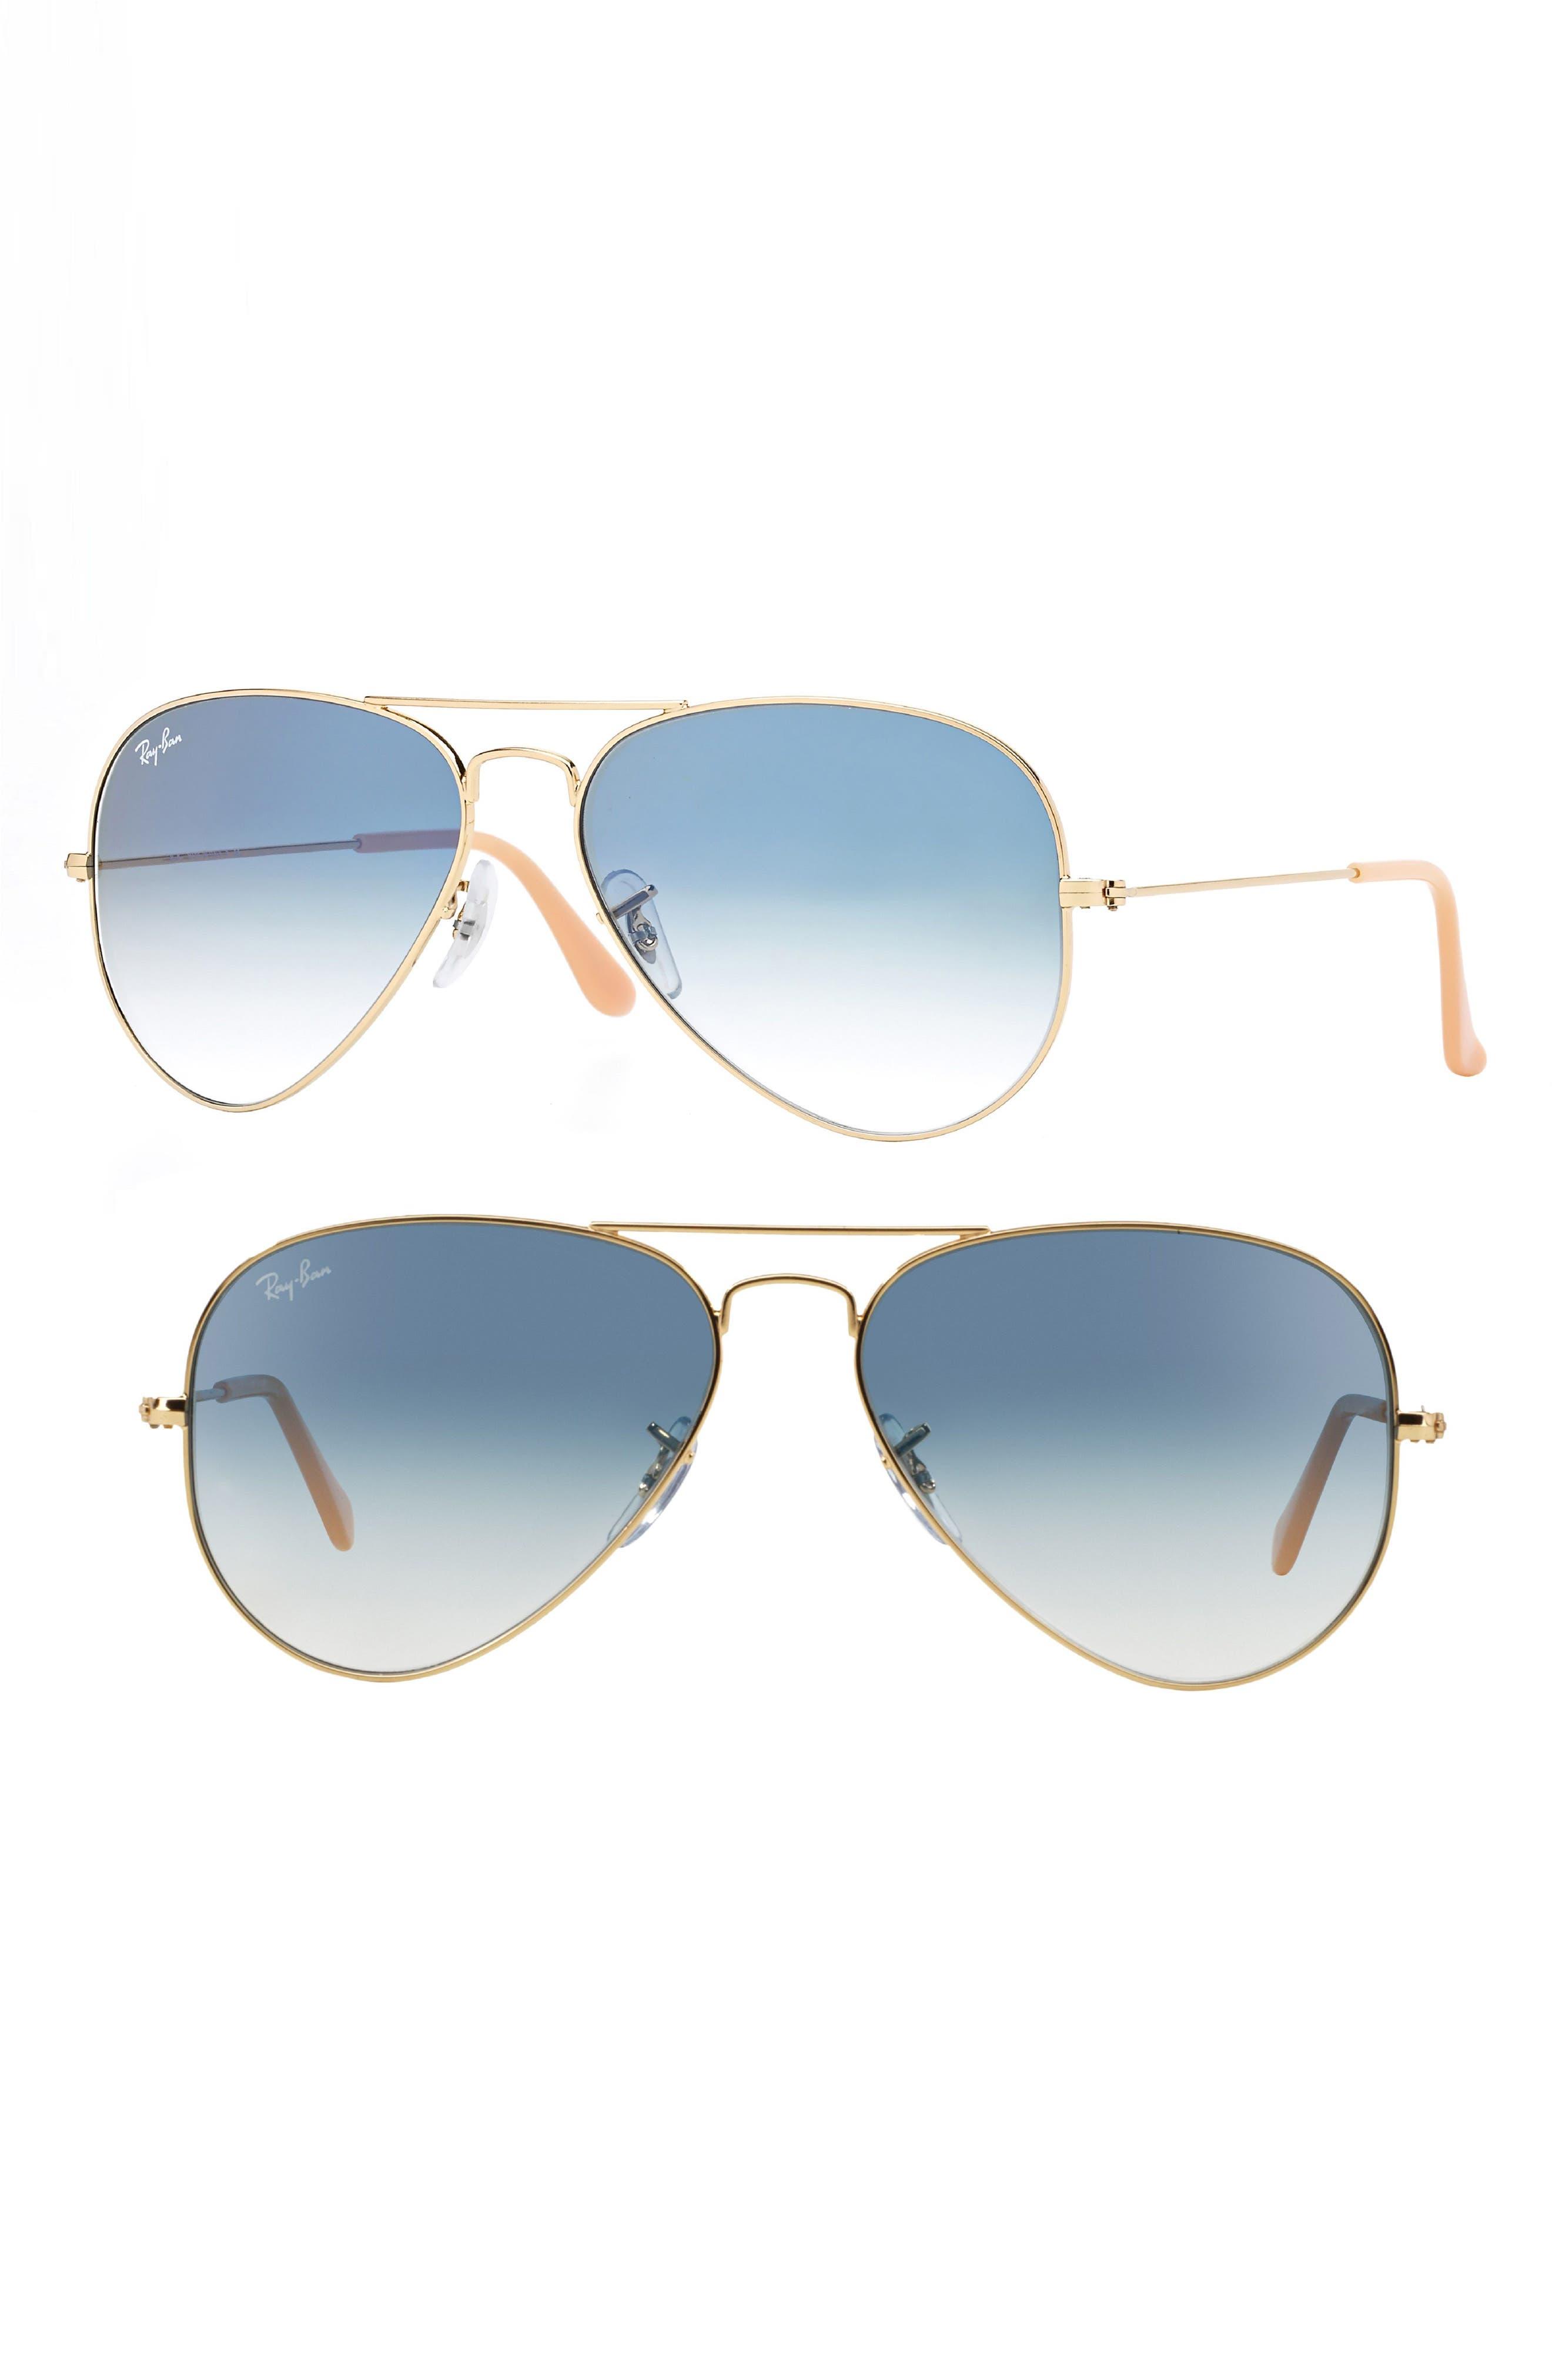 Ray-Ban Small Original 55Mm Aviator Sunglasses - Blue Grd